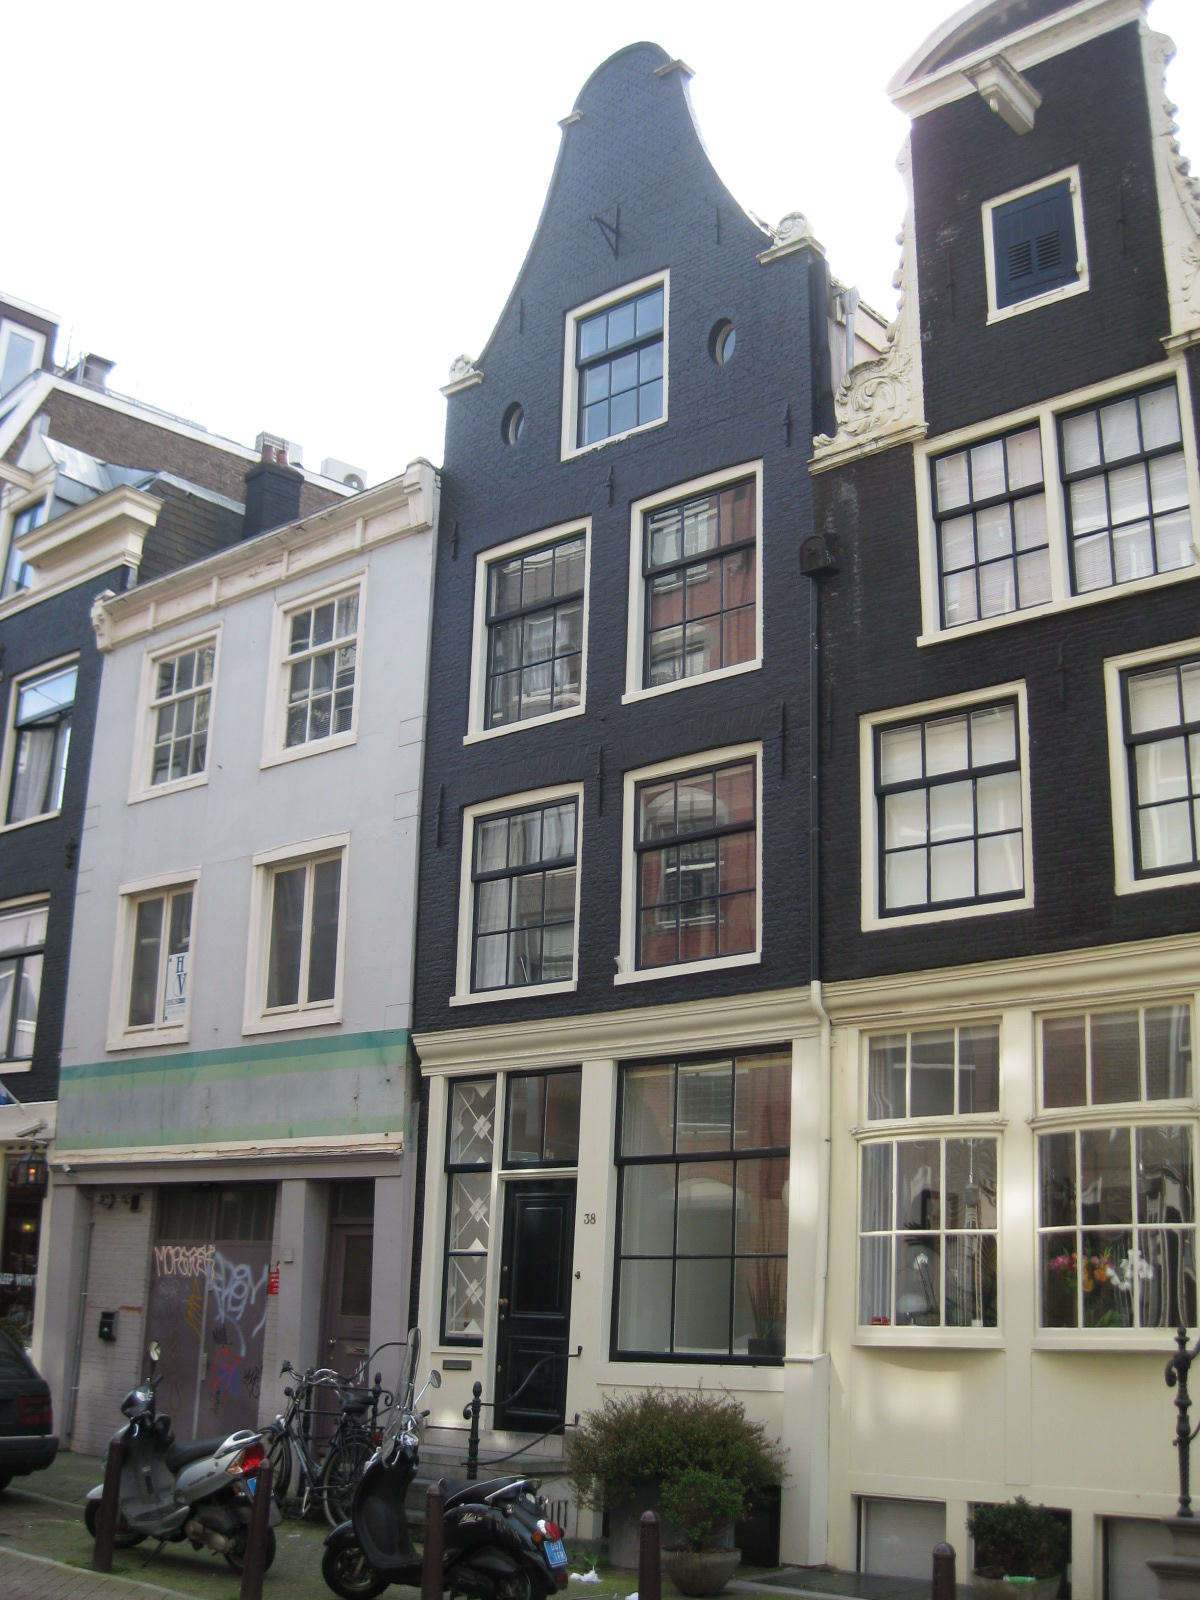 Huis waarvan de gevel verhoogd is in amsterdam monument - Huis gevel ...